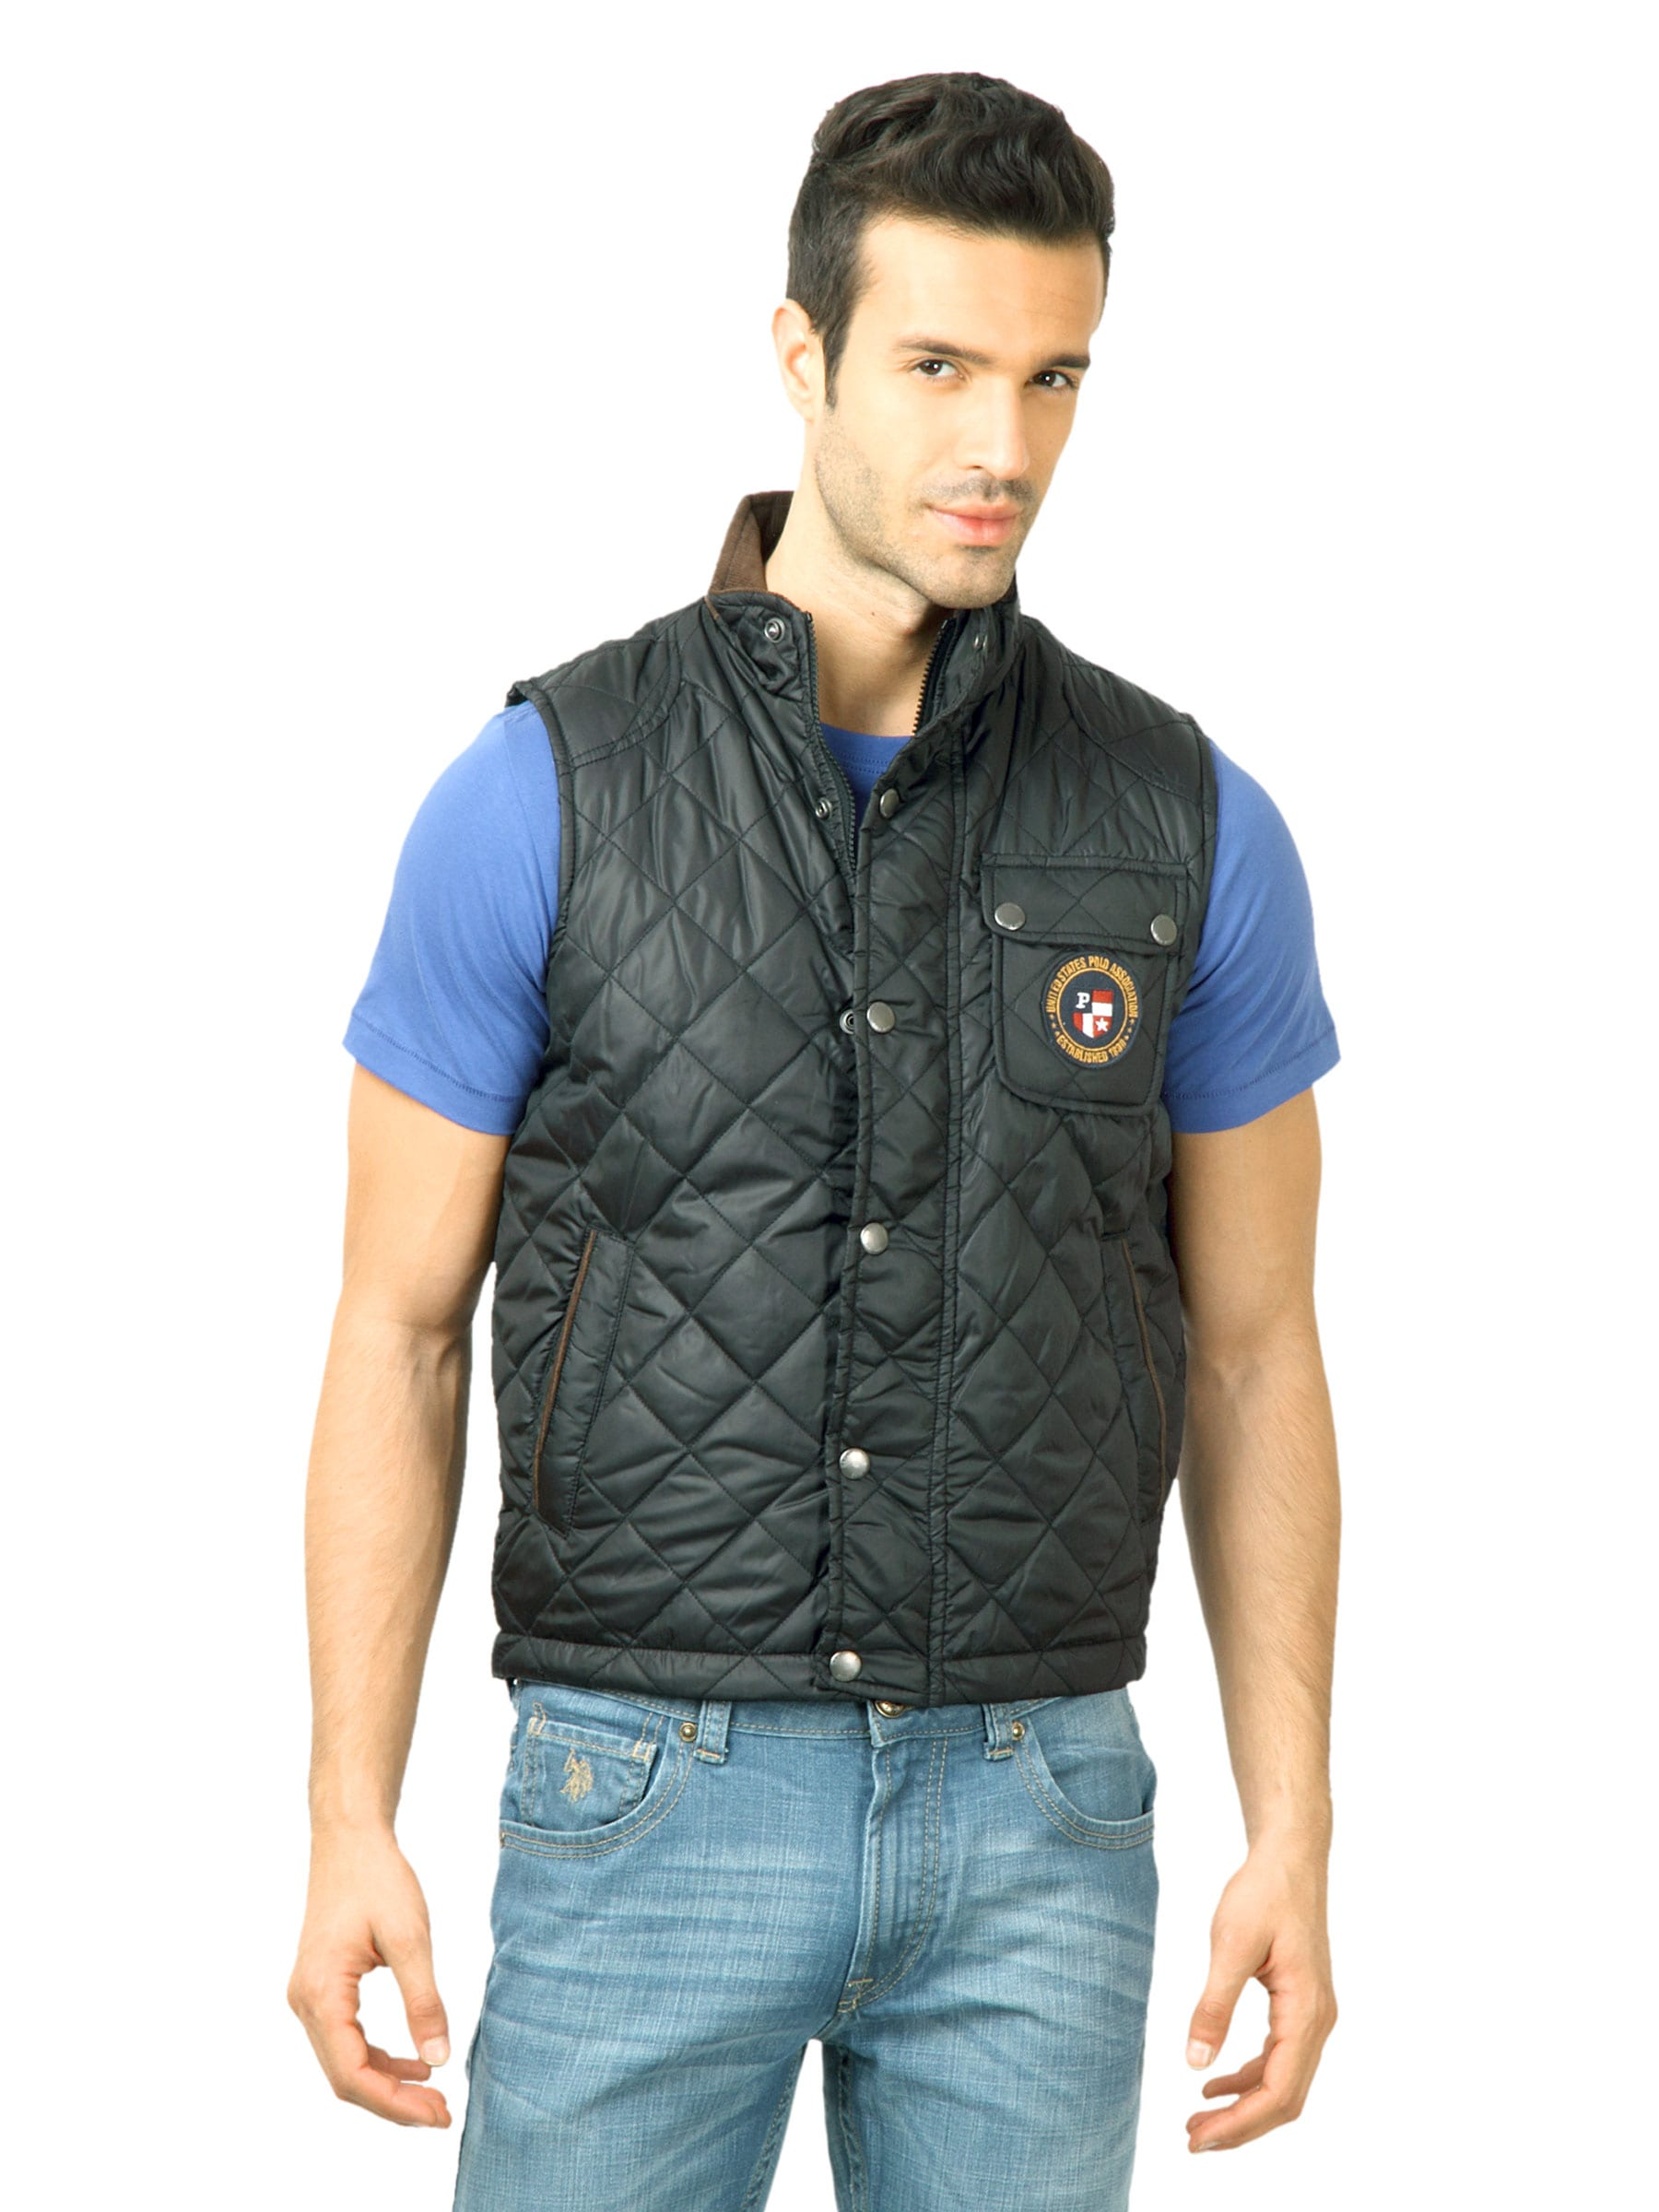 U.S. Polo Assn. Men Solid Black Jackets